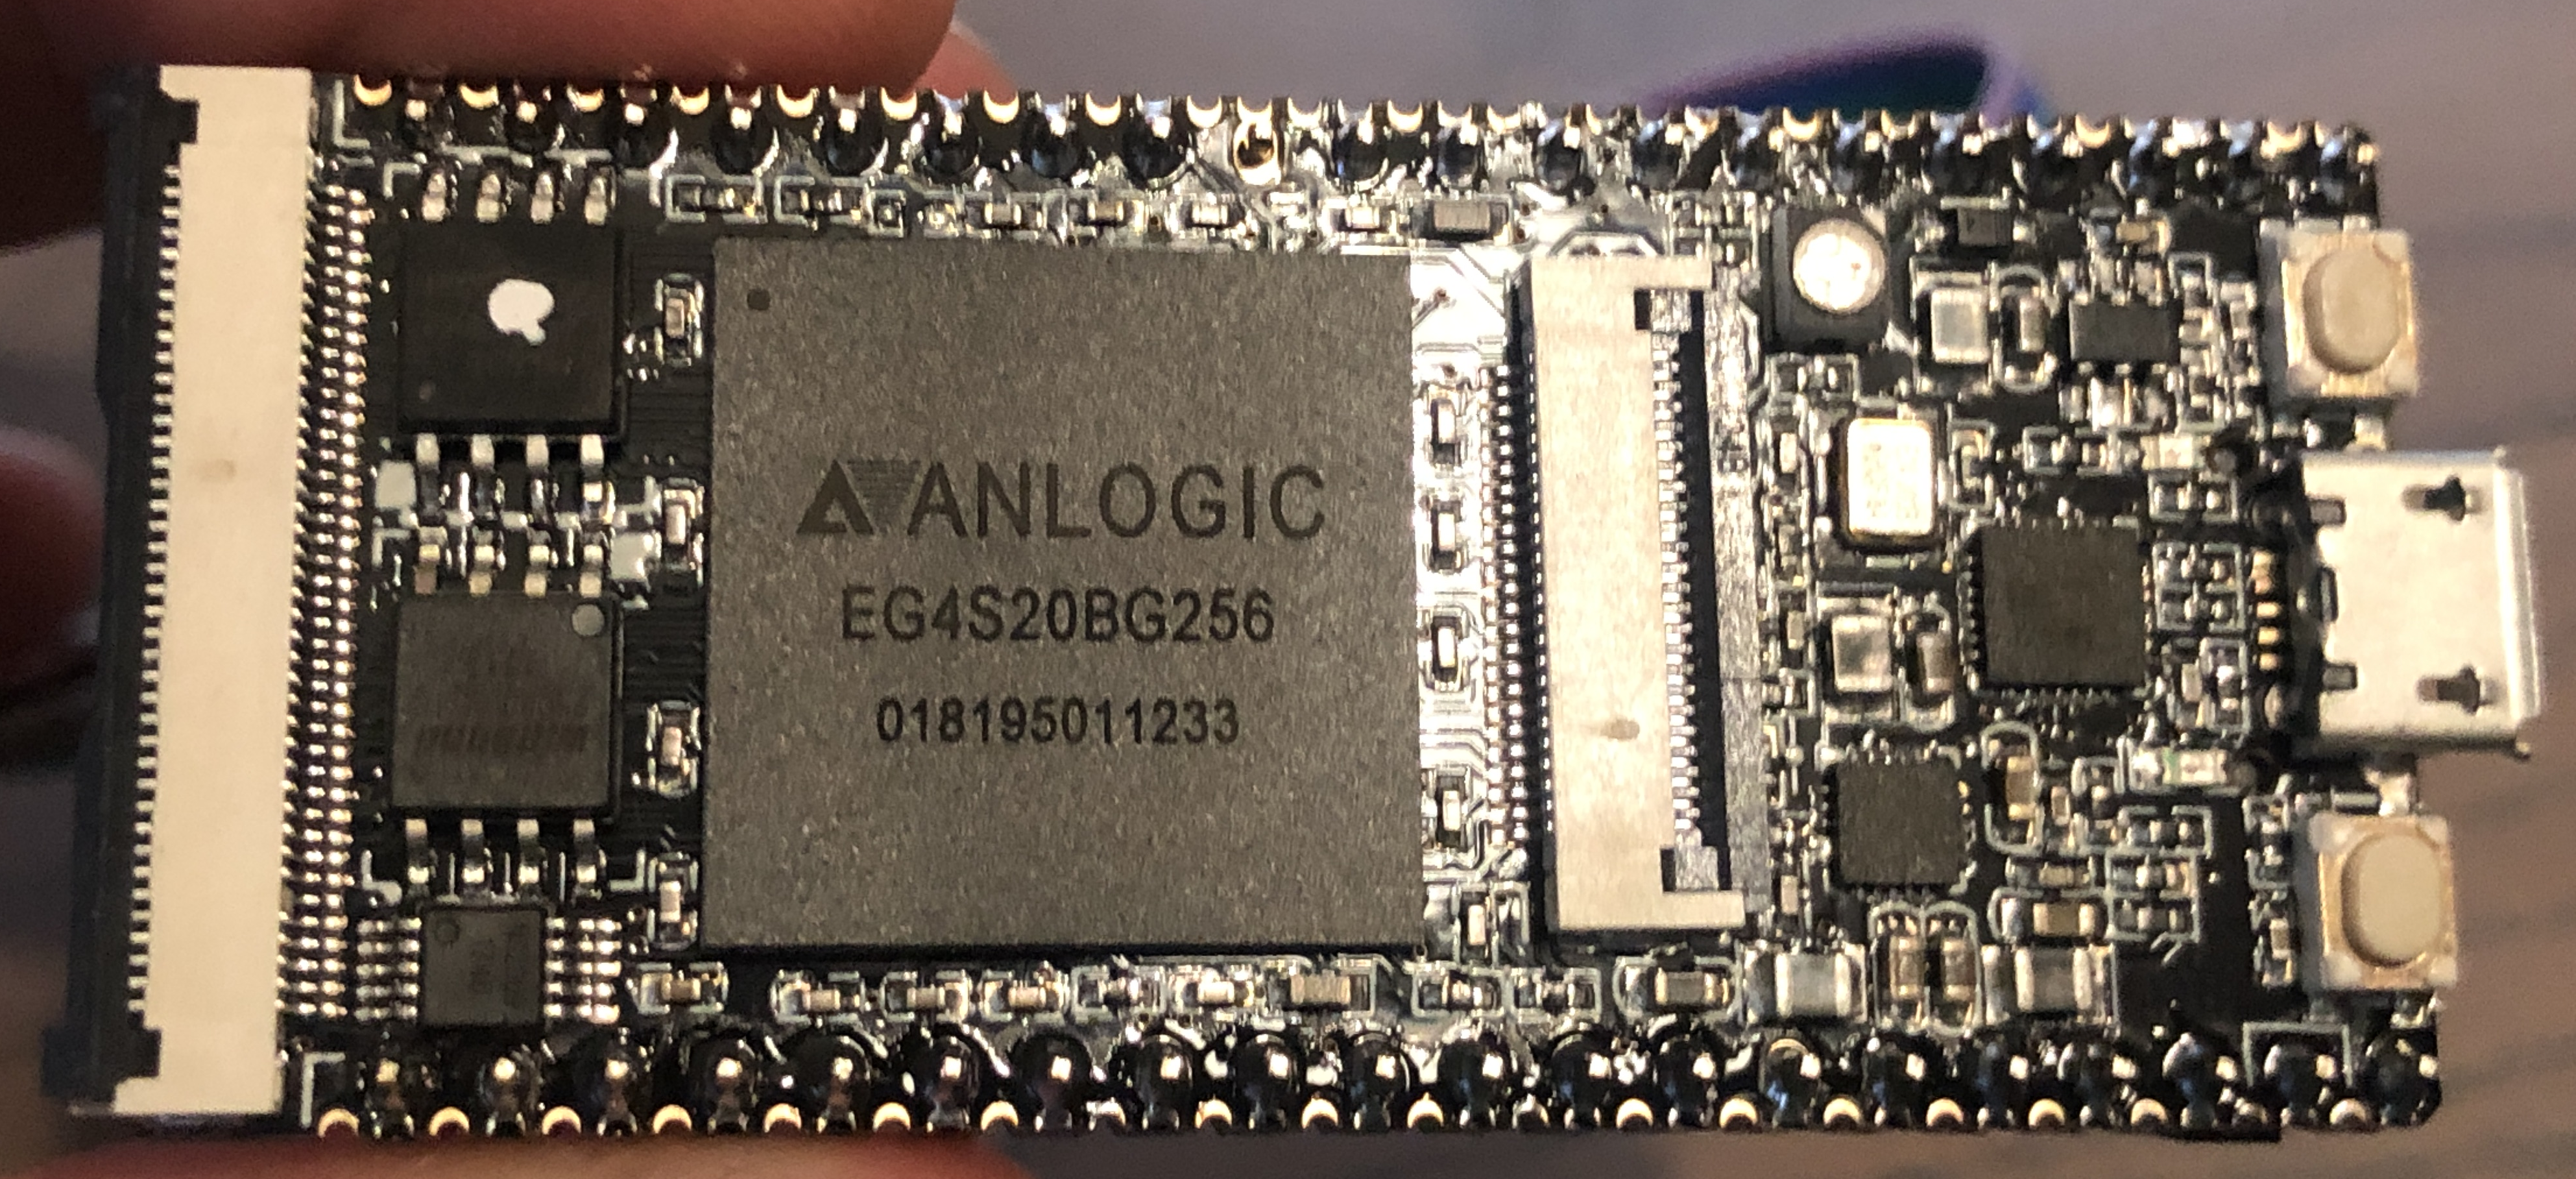 Hello World on the Lichee Tang RISC-V/FPGA board - jaeblog